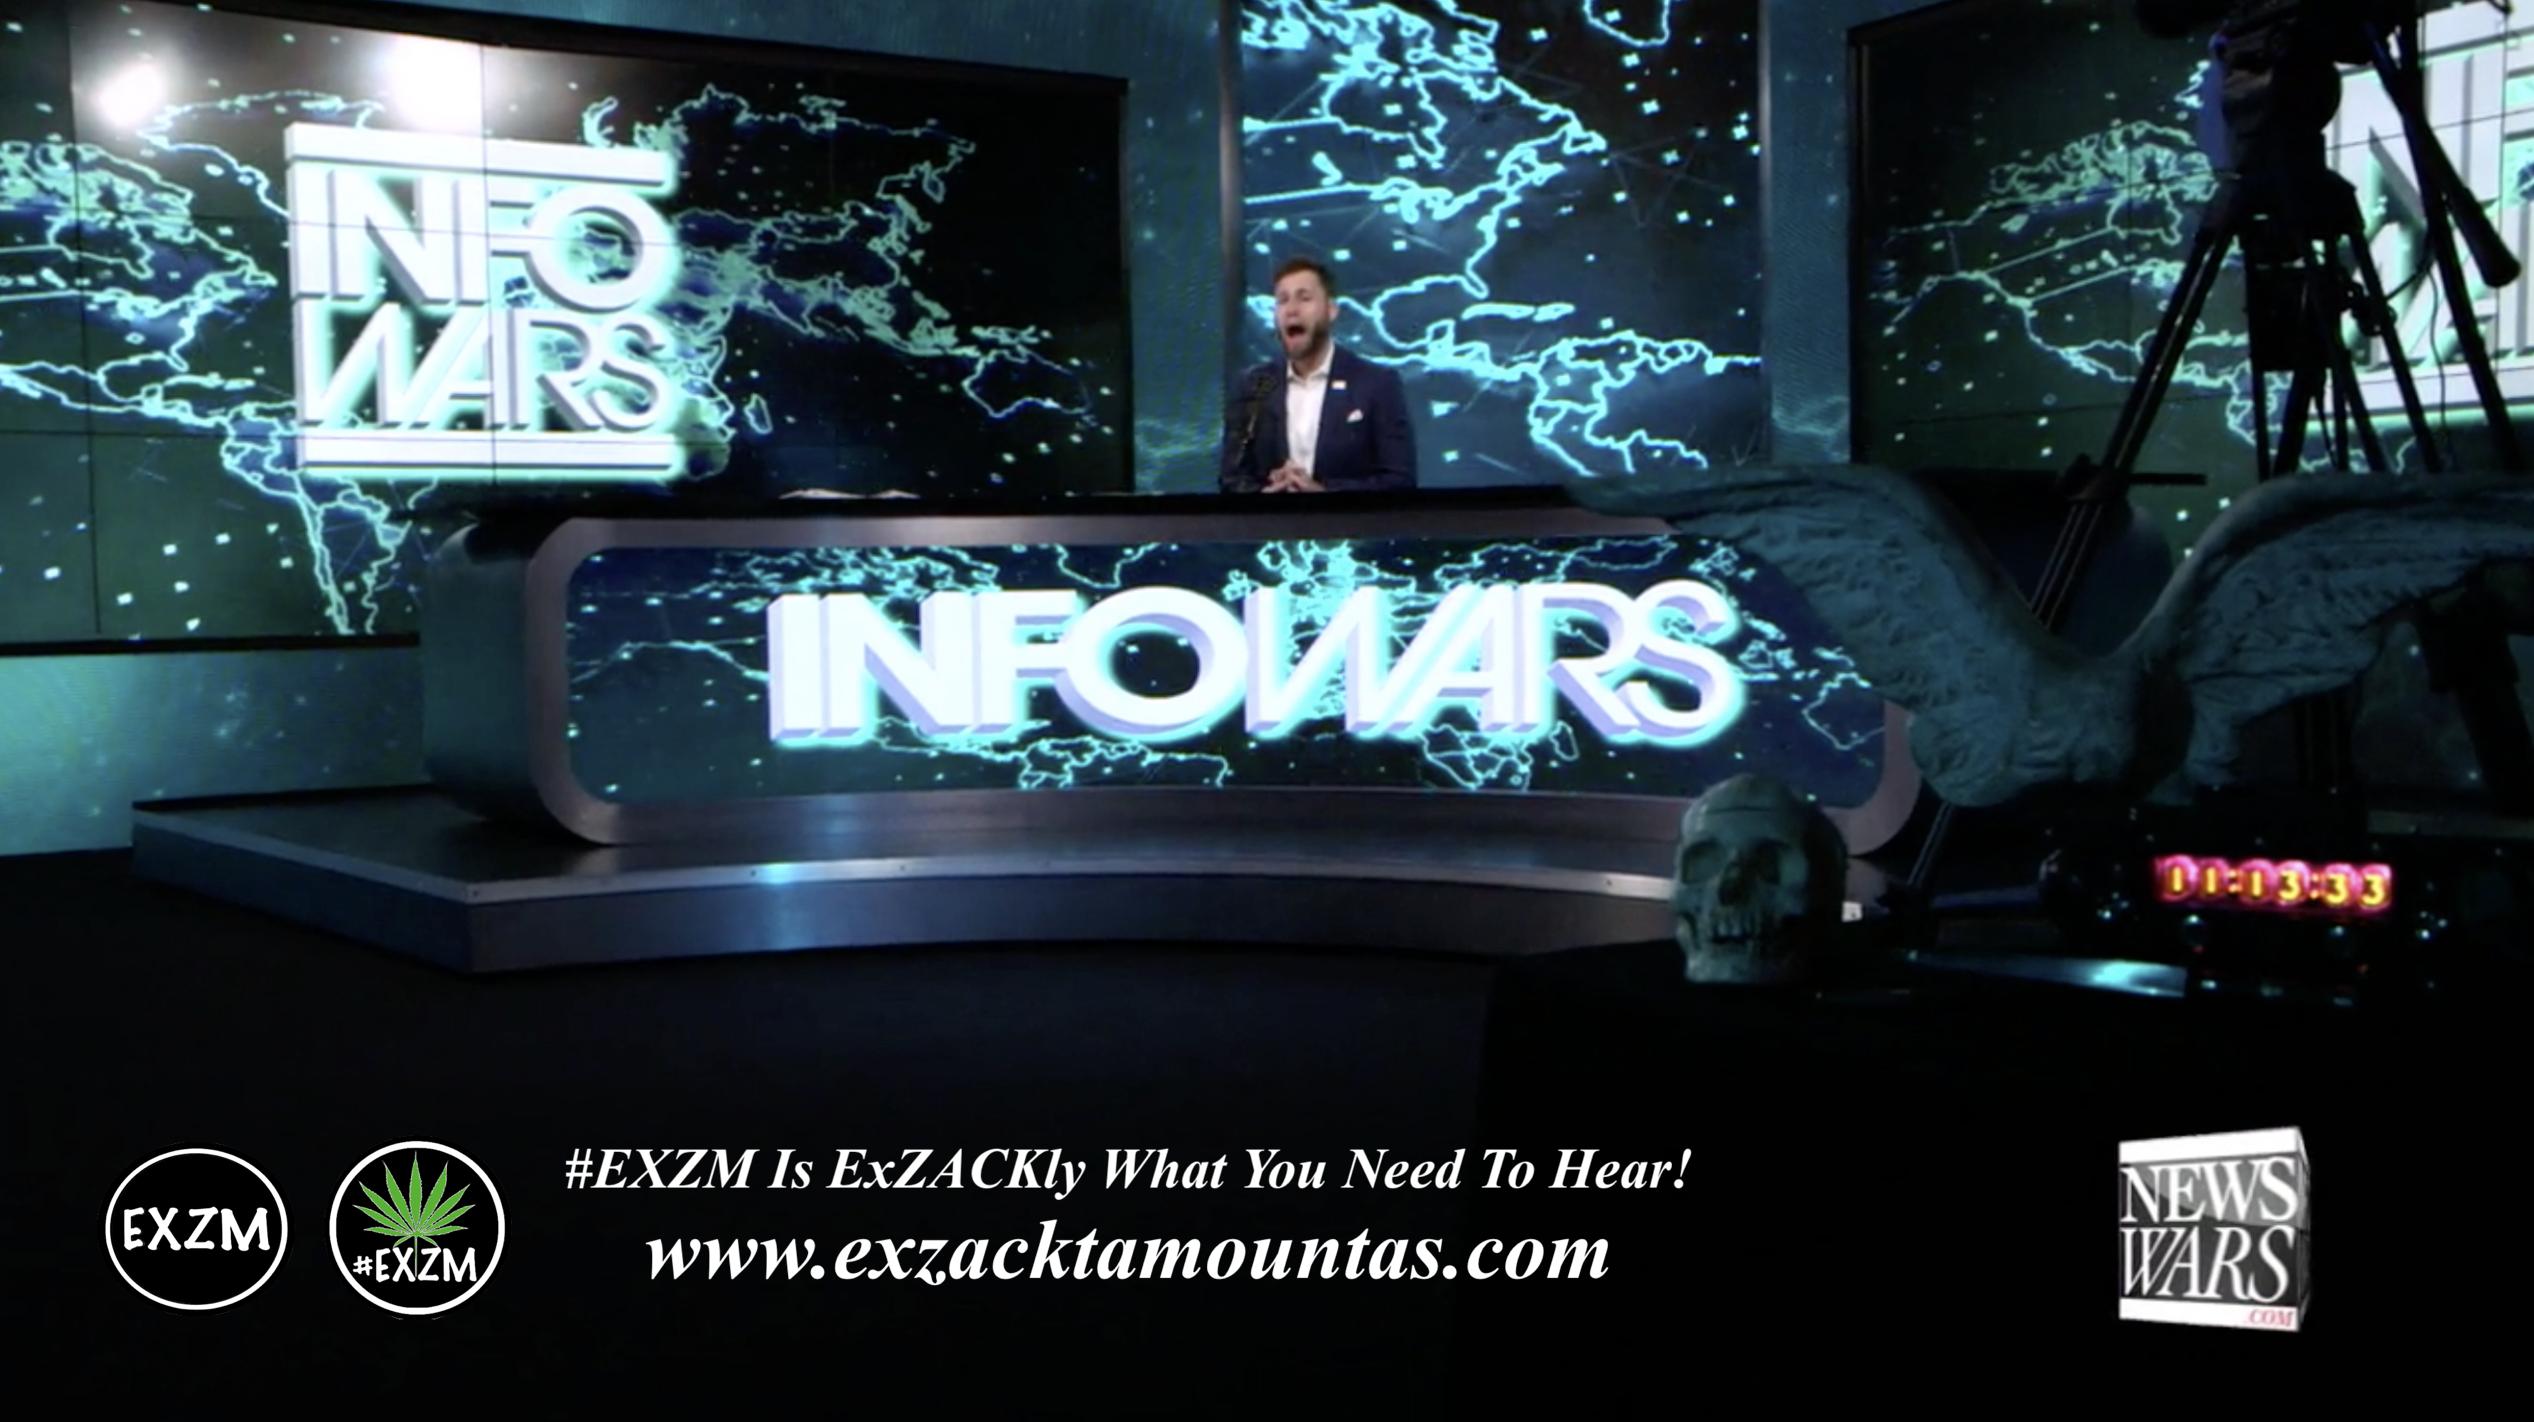 Owen Shroyer Live In Infowars Studio Human Skull Angel Wings EXZM Zack Mount May 21st 2021 copy